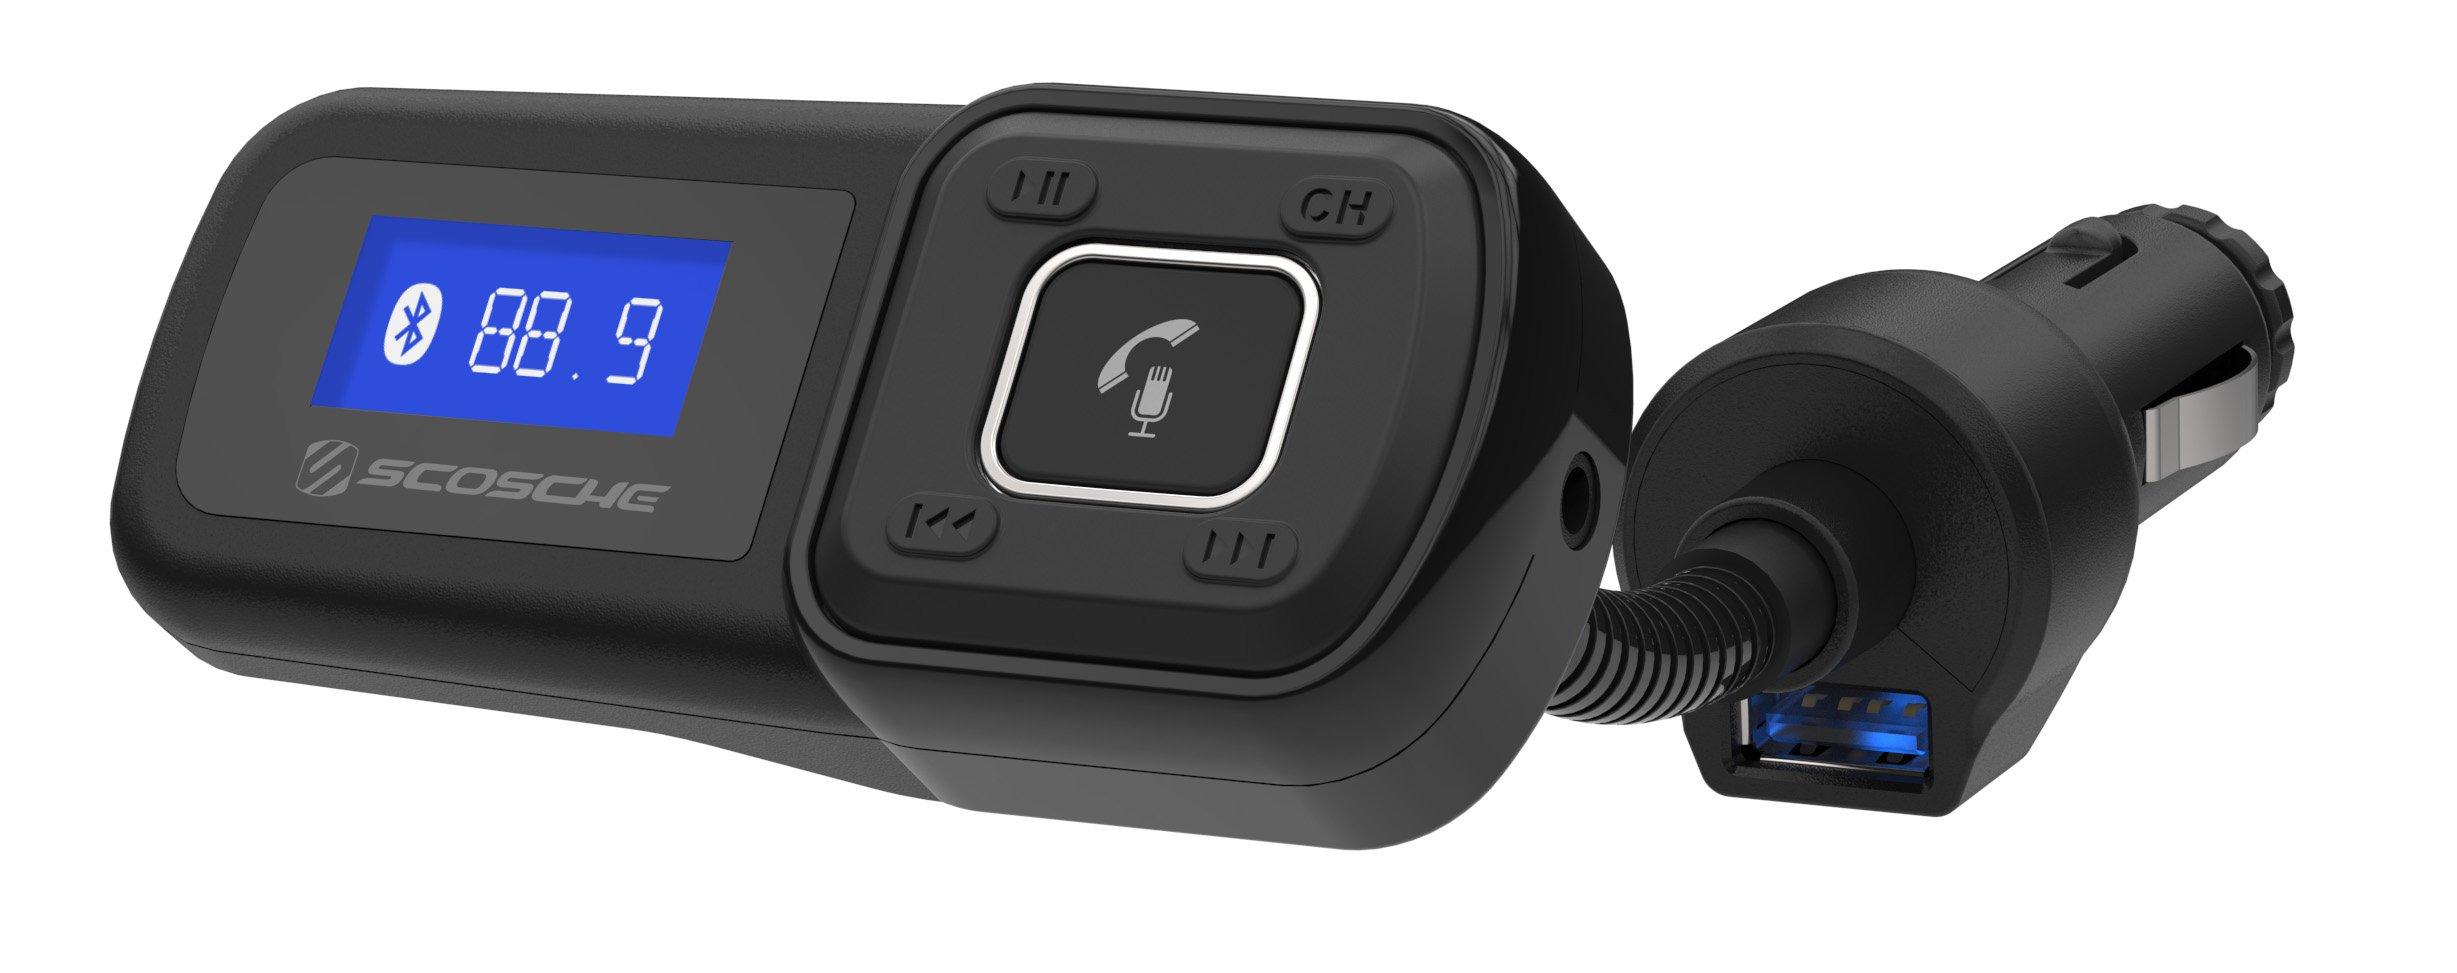 SCOSCHE BTFM2A BTFREQ Universal Bluetooth Hands-Free Car Kit with Digital FM Transmitter and 10-Watt USB Car Charger by Scosche